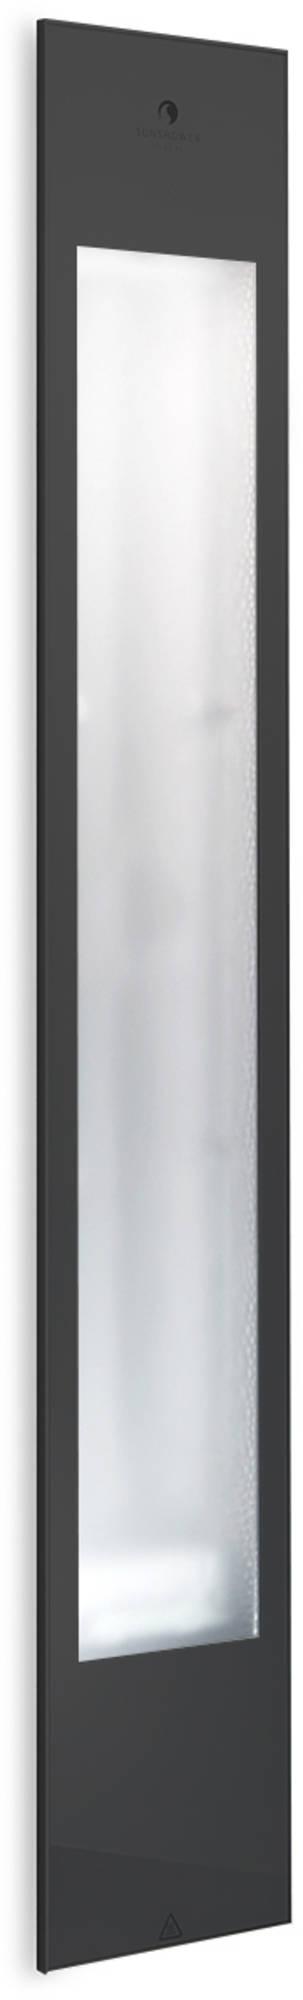 Productafbeelding van Sunshower Pure Black XL Infrarood Inbouwapparaat 19.9x123.8x10cm Full Body 2000watt Aluminium